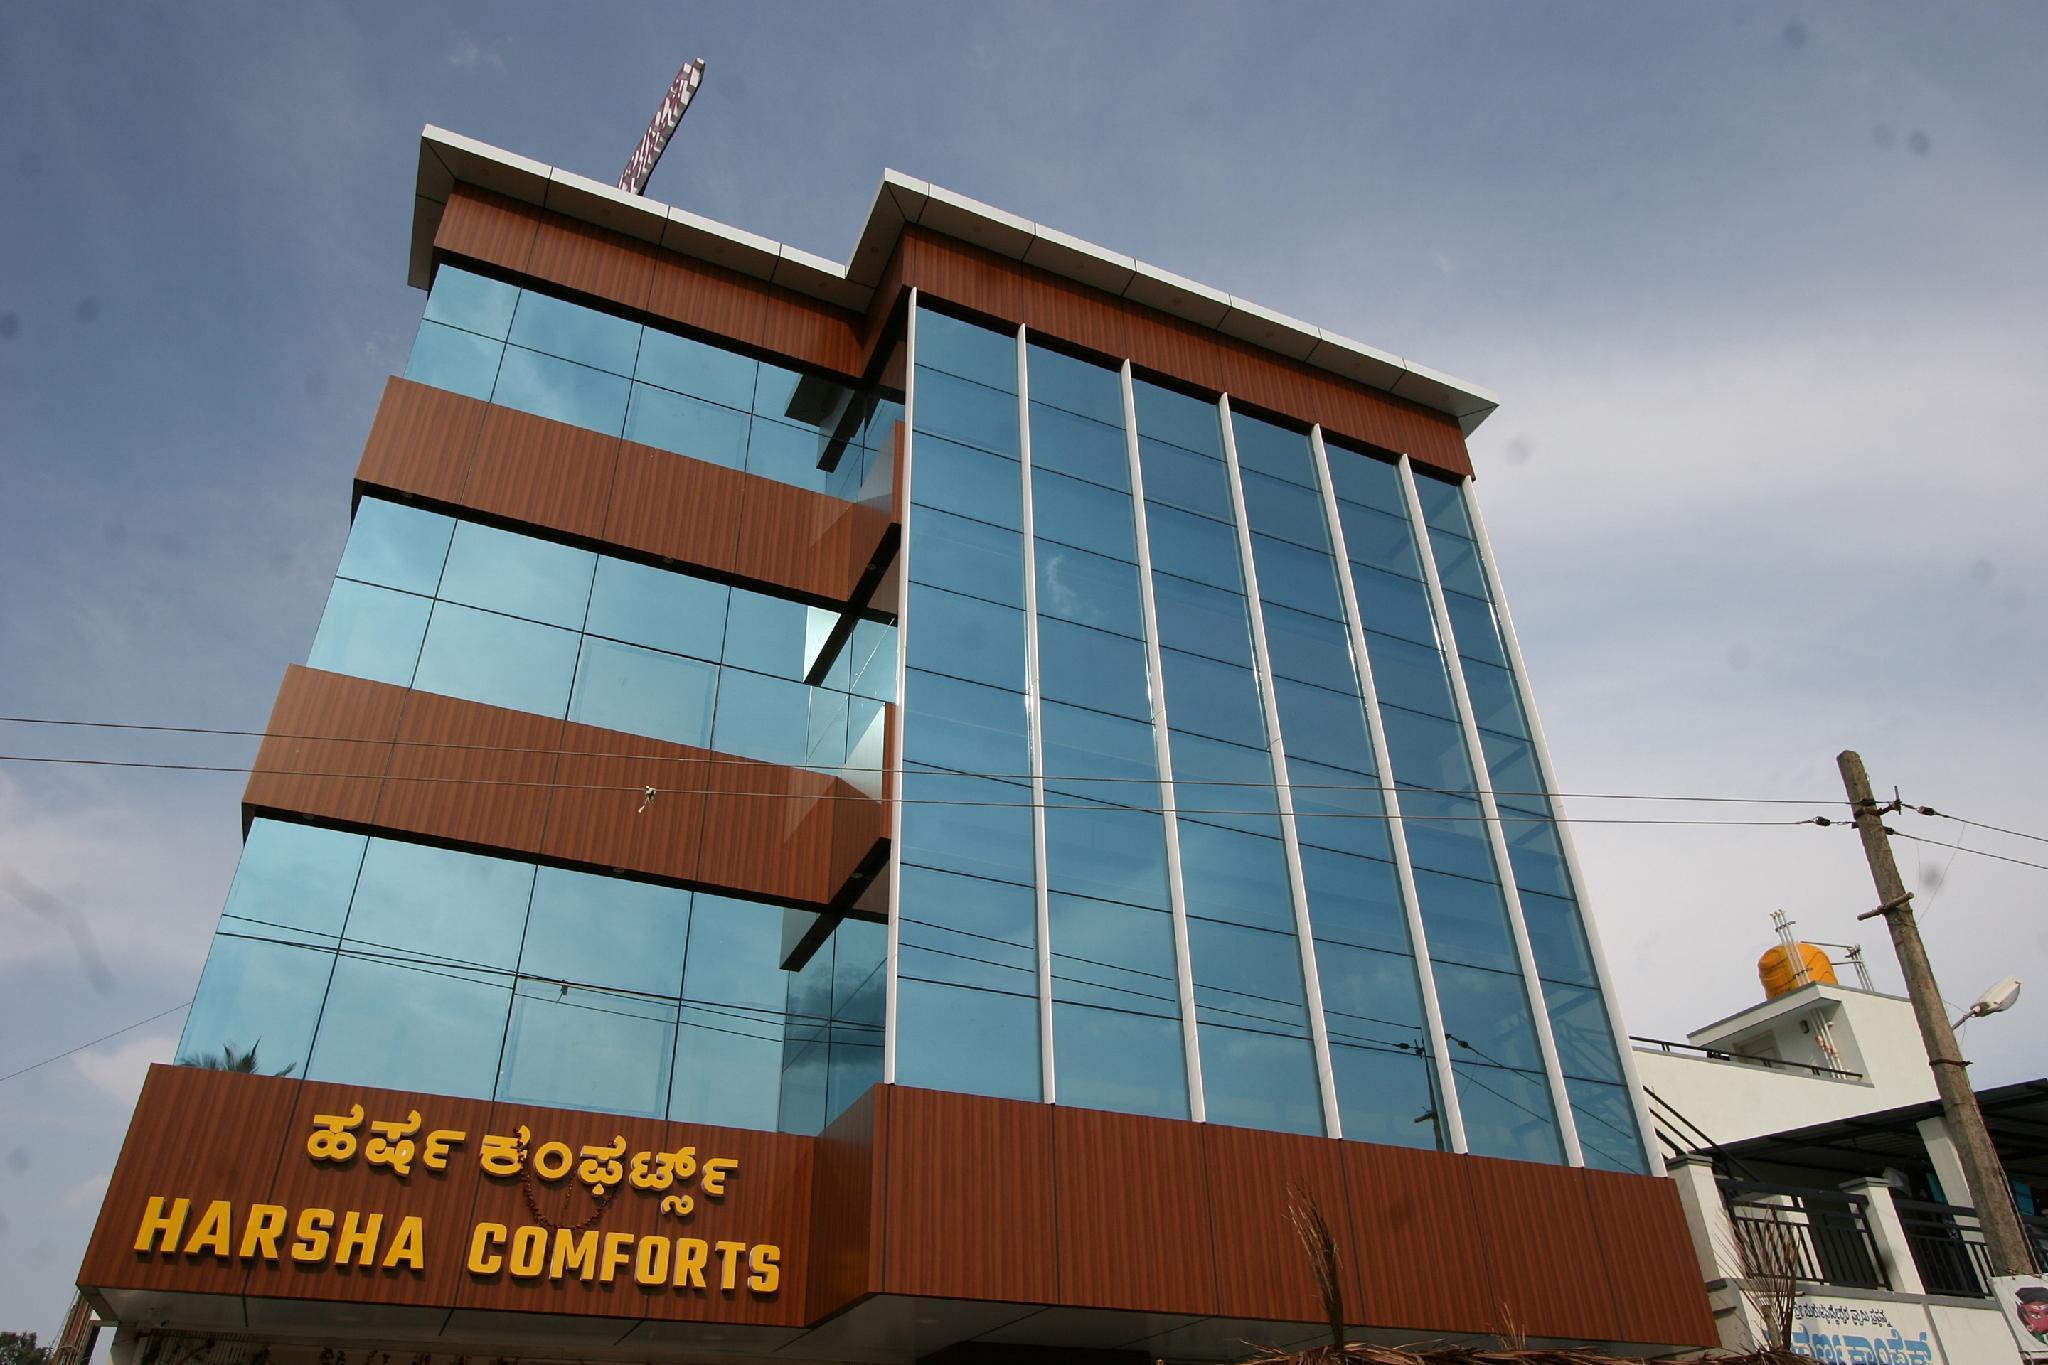 OYO 28556 Harsha Comforts, Chikmagalur